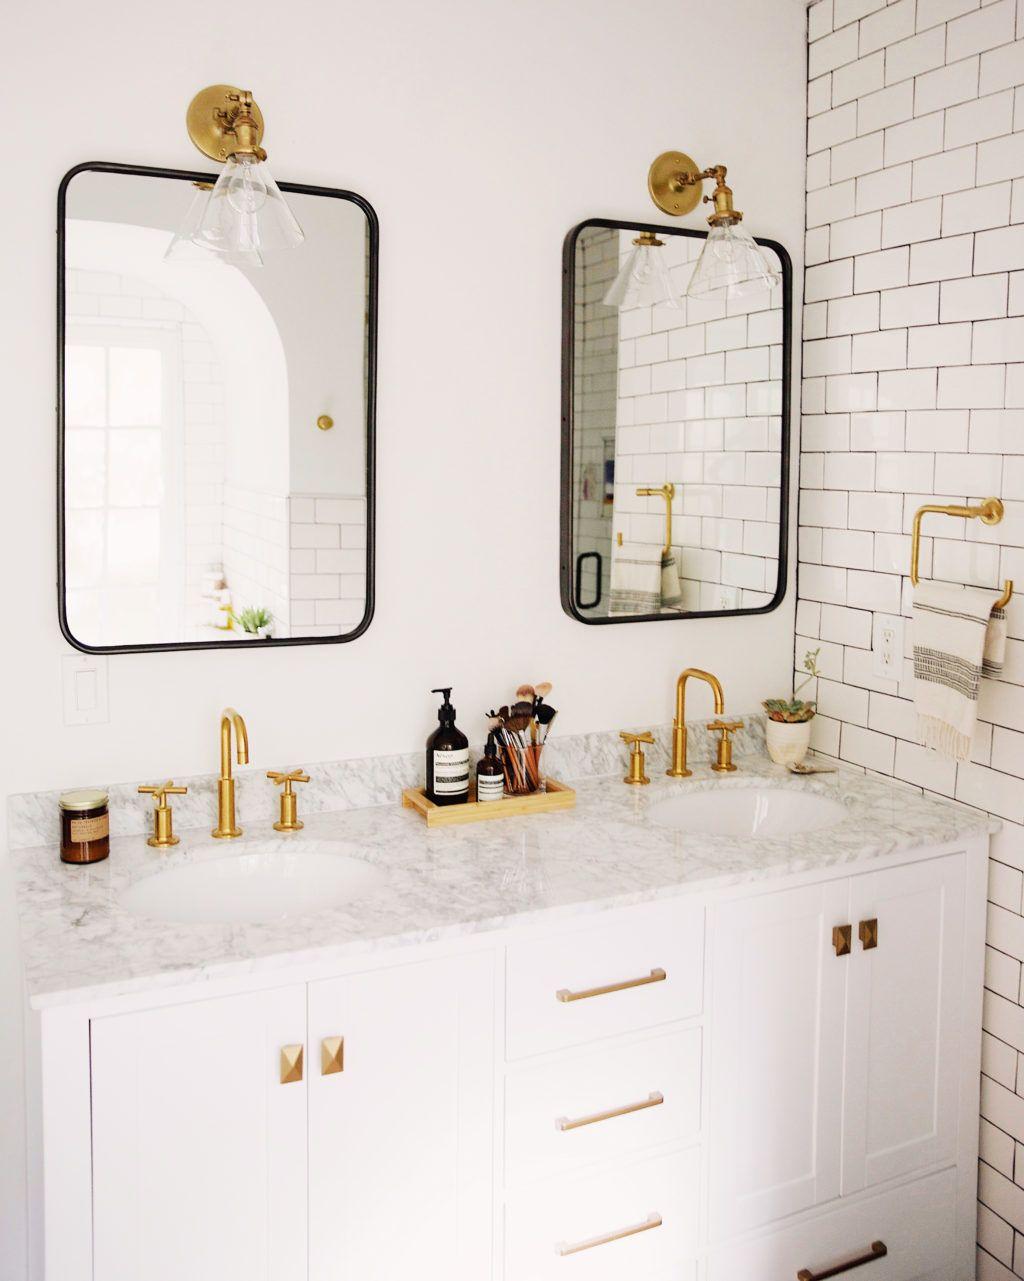 17 Bathroom Mirrors Ideas Decor Design Inspirations For Bathroom Master Bathrooms